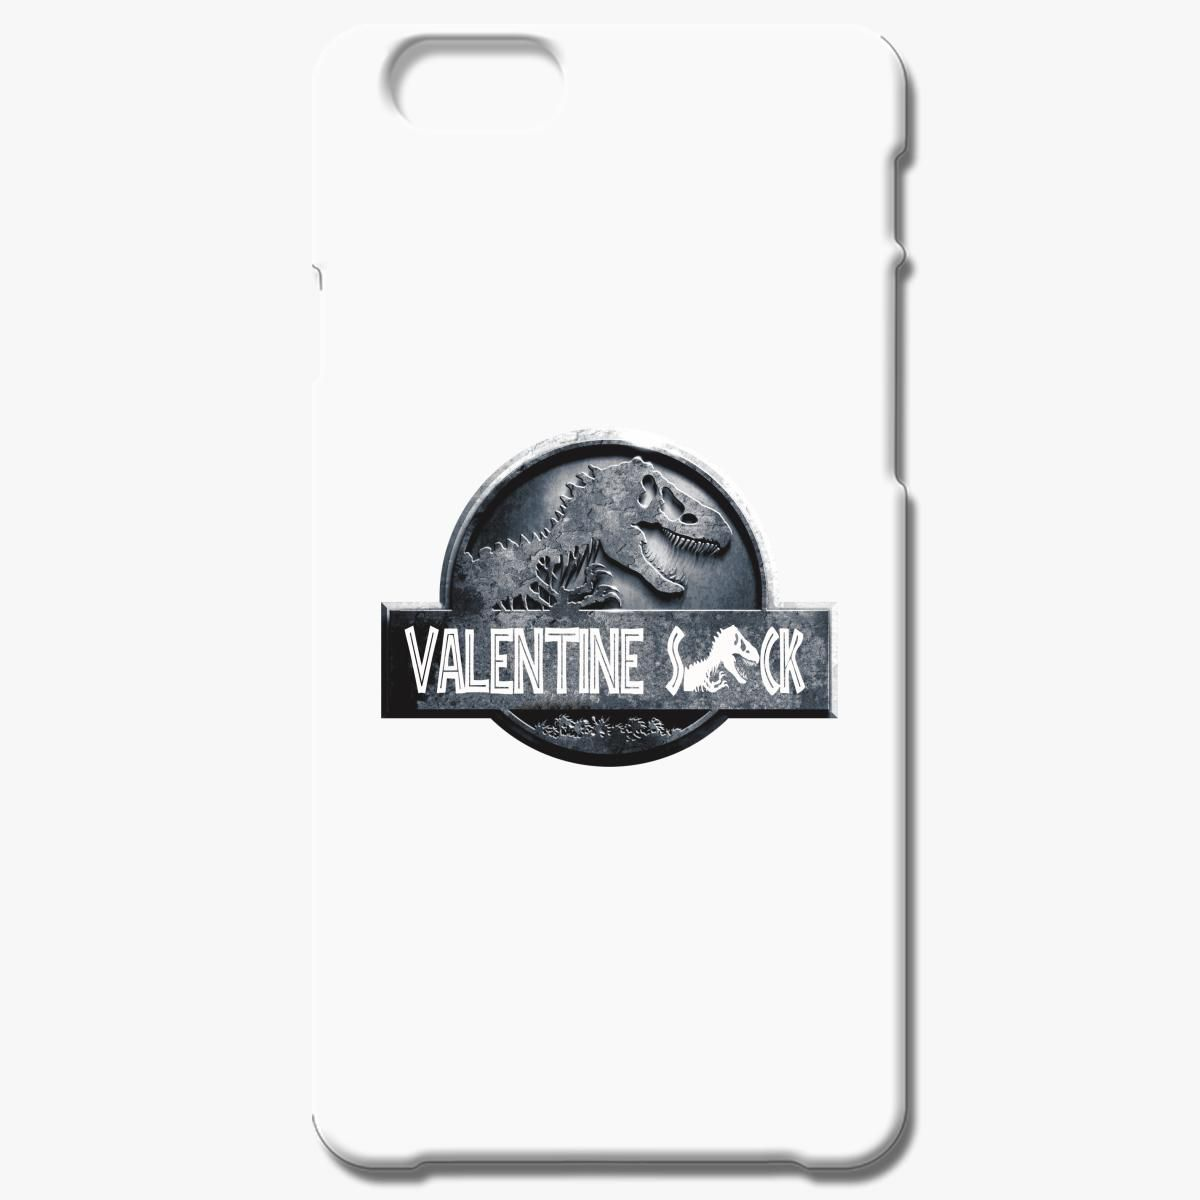 Valentine Jurassic Sck Iphone 6 6s Plus Case